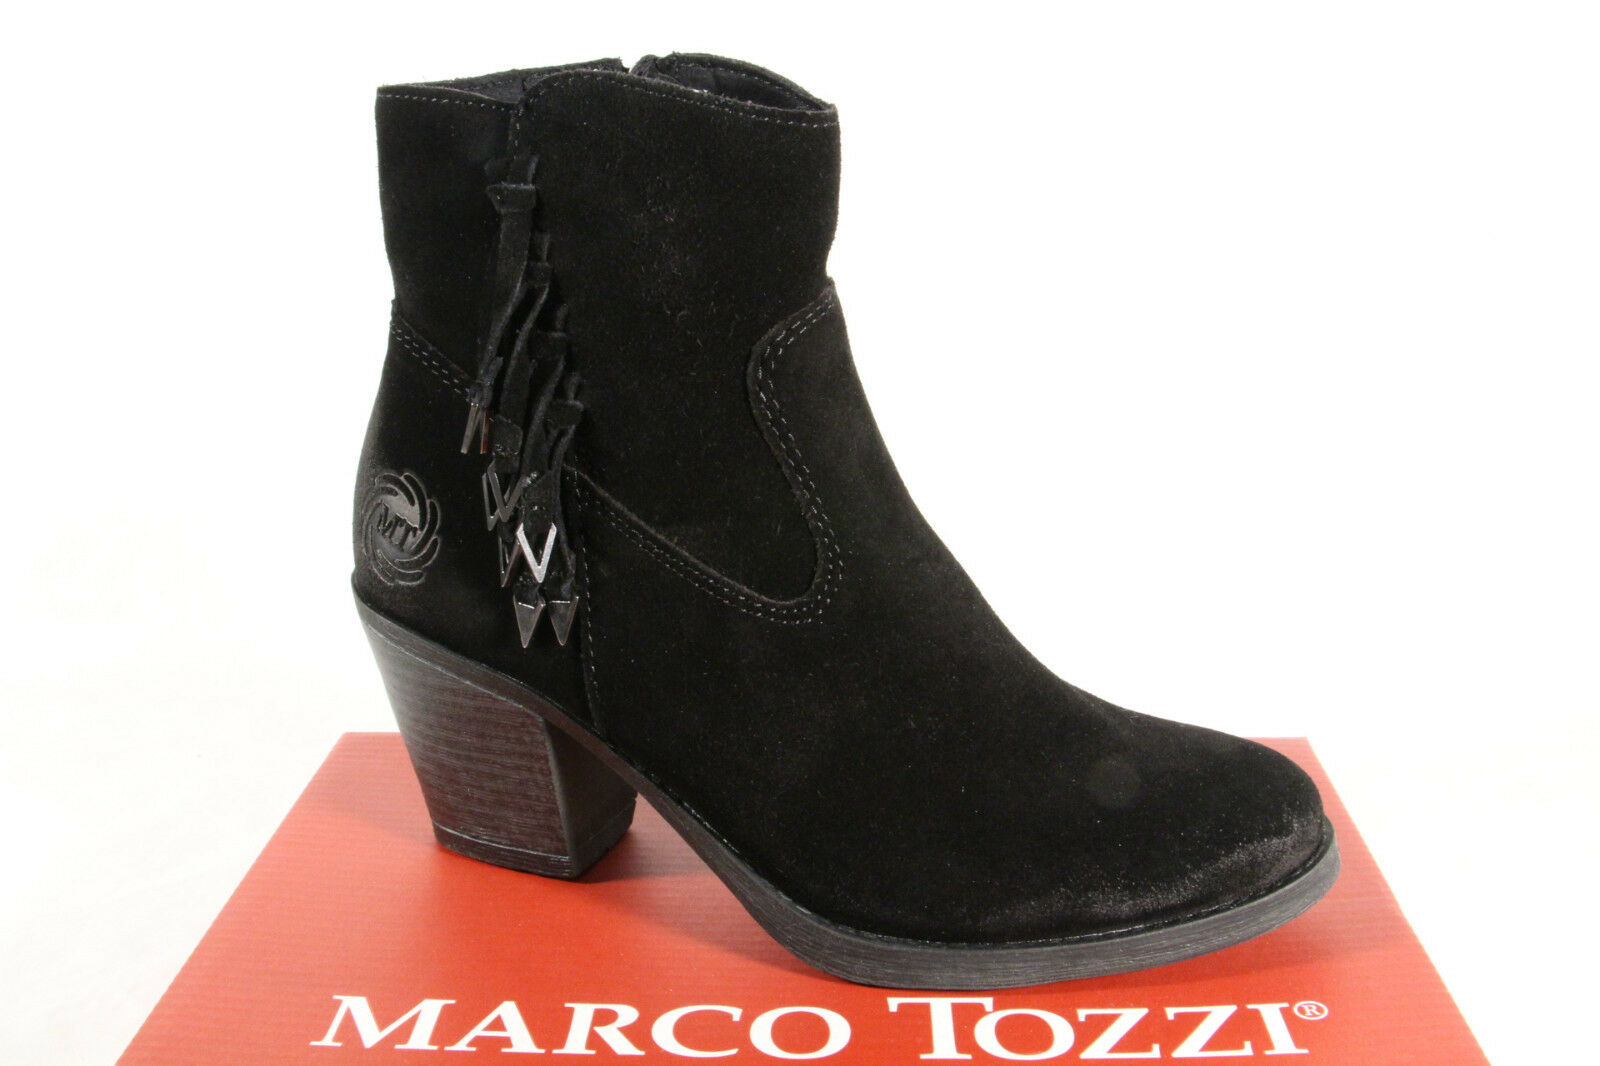 Marco  Tozzi Damen Stiefel Stiefeletten 25375  Marco Stiefel Echtleder schwarz  NEU 822382